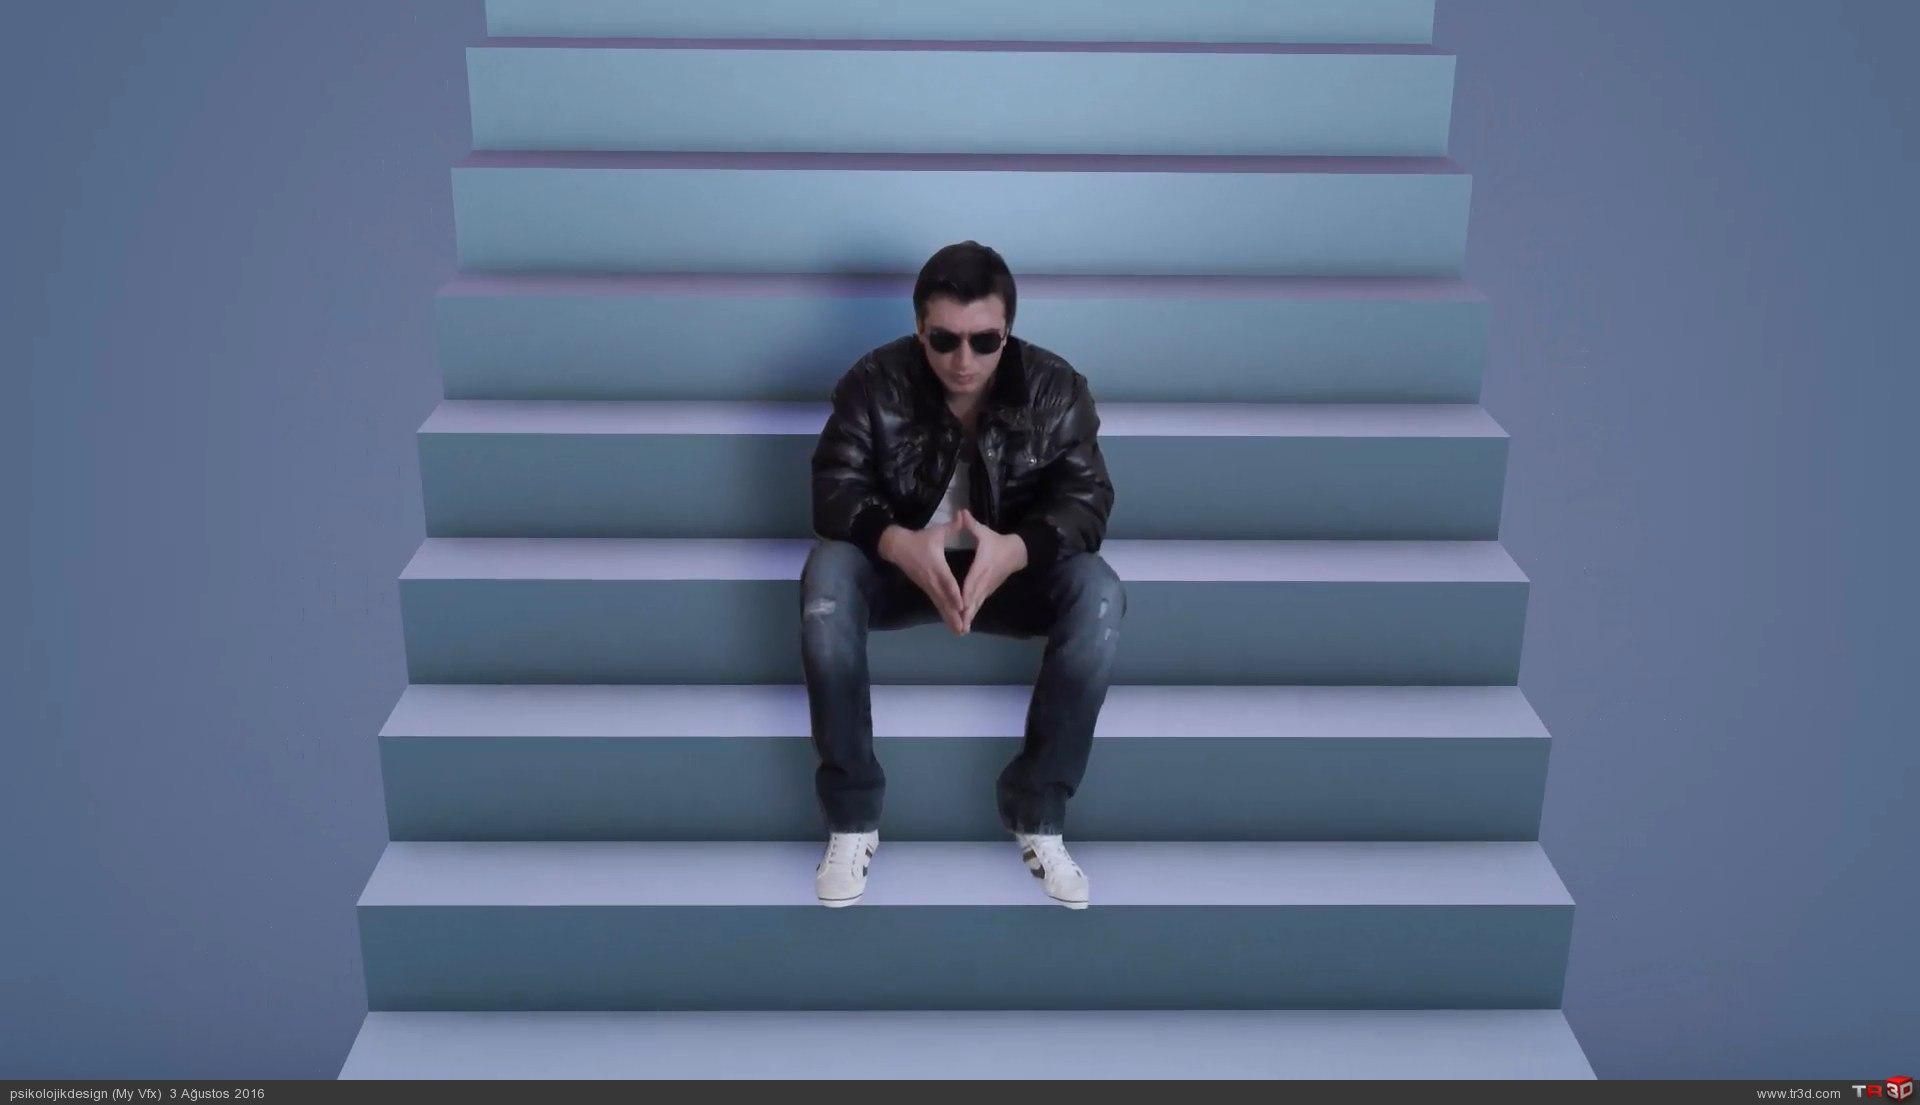 Drake Hotline Bling & Myvfx Karşılaştırma   After Effects - Cinema 4d Klip Yapım Dersi  4